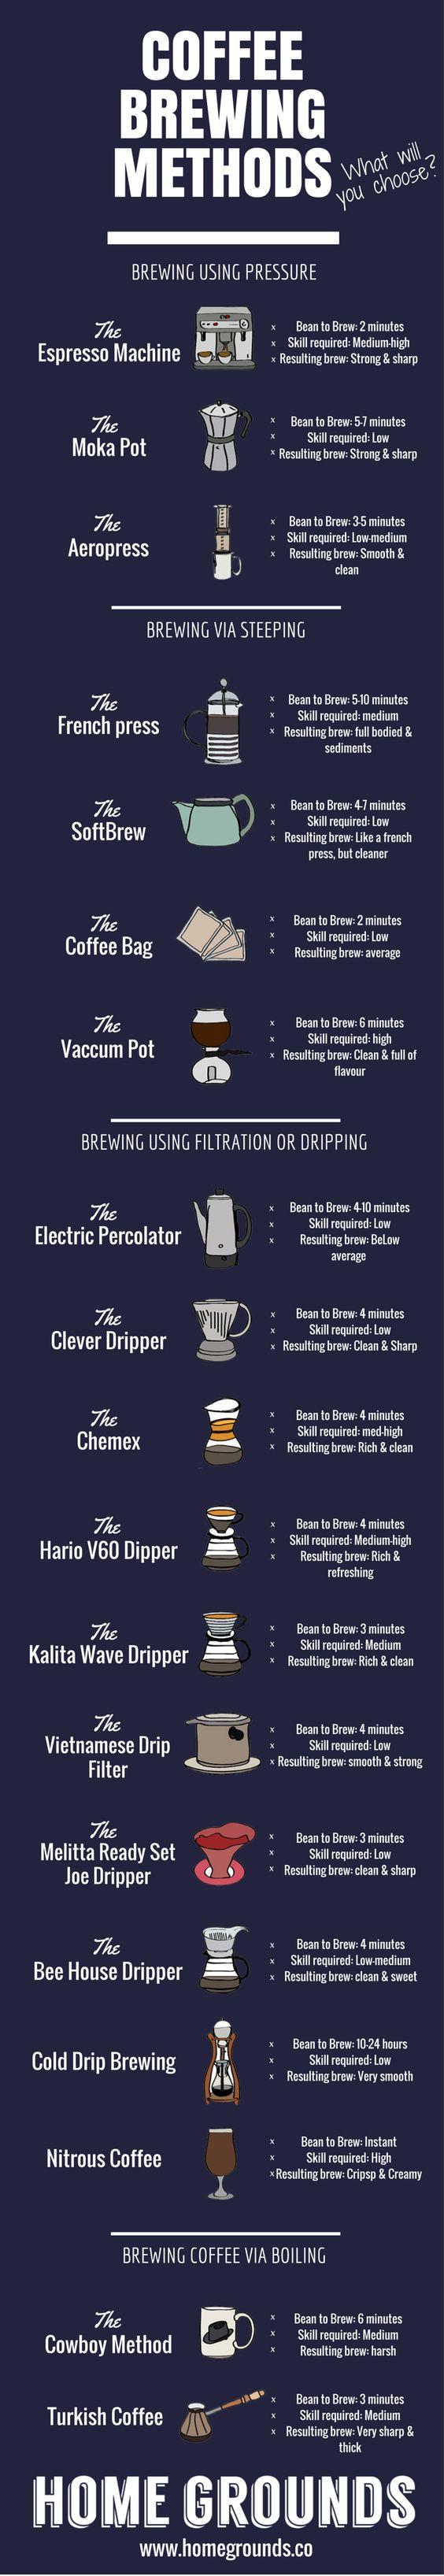 #Coffee Brewing Methods: 19 Kickass Ways to Brew Sensational Coffee - Home Grounds